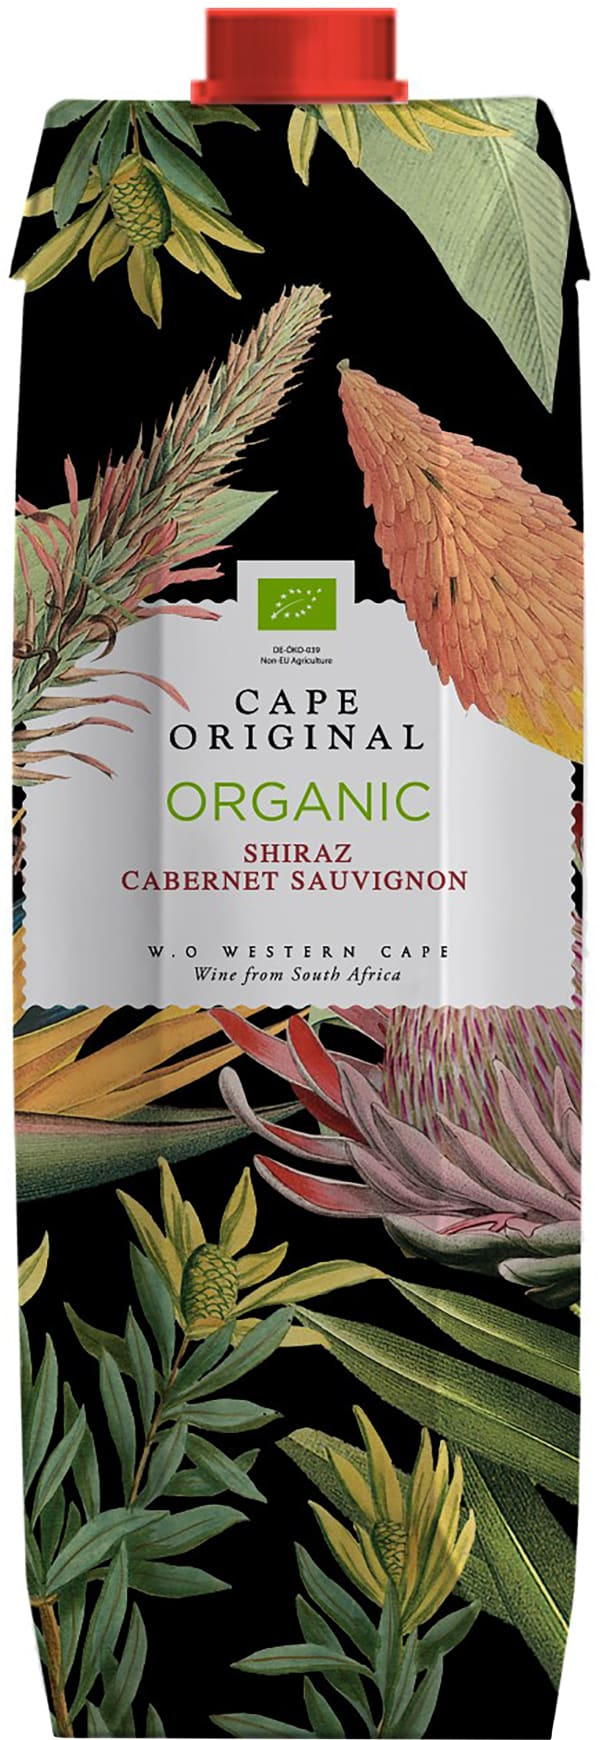 Cape Original Shiraz Cabernet Sauvignon Organic 2016 kartongförpackning